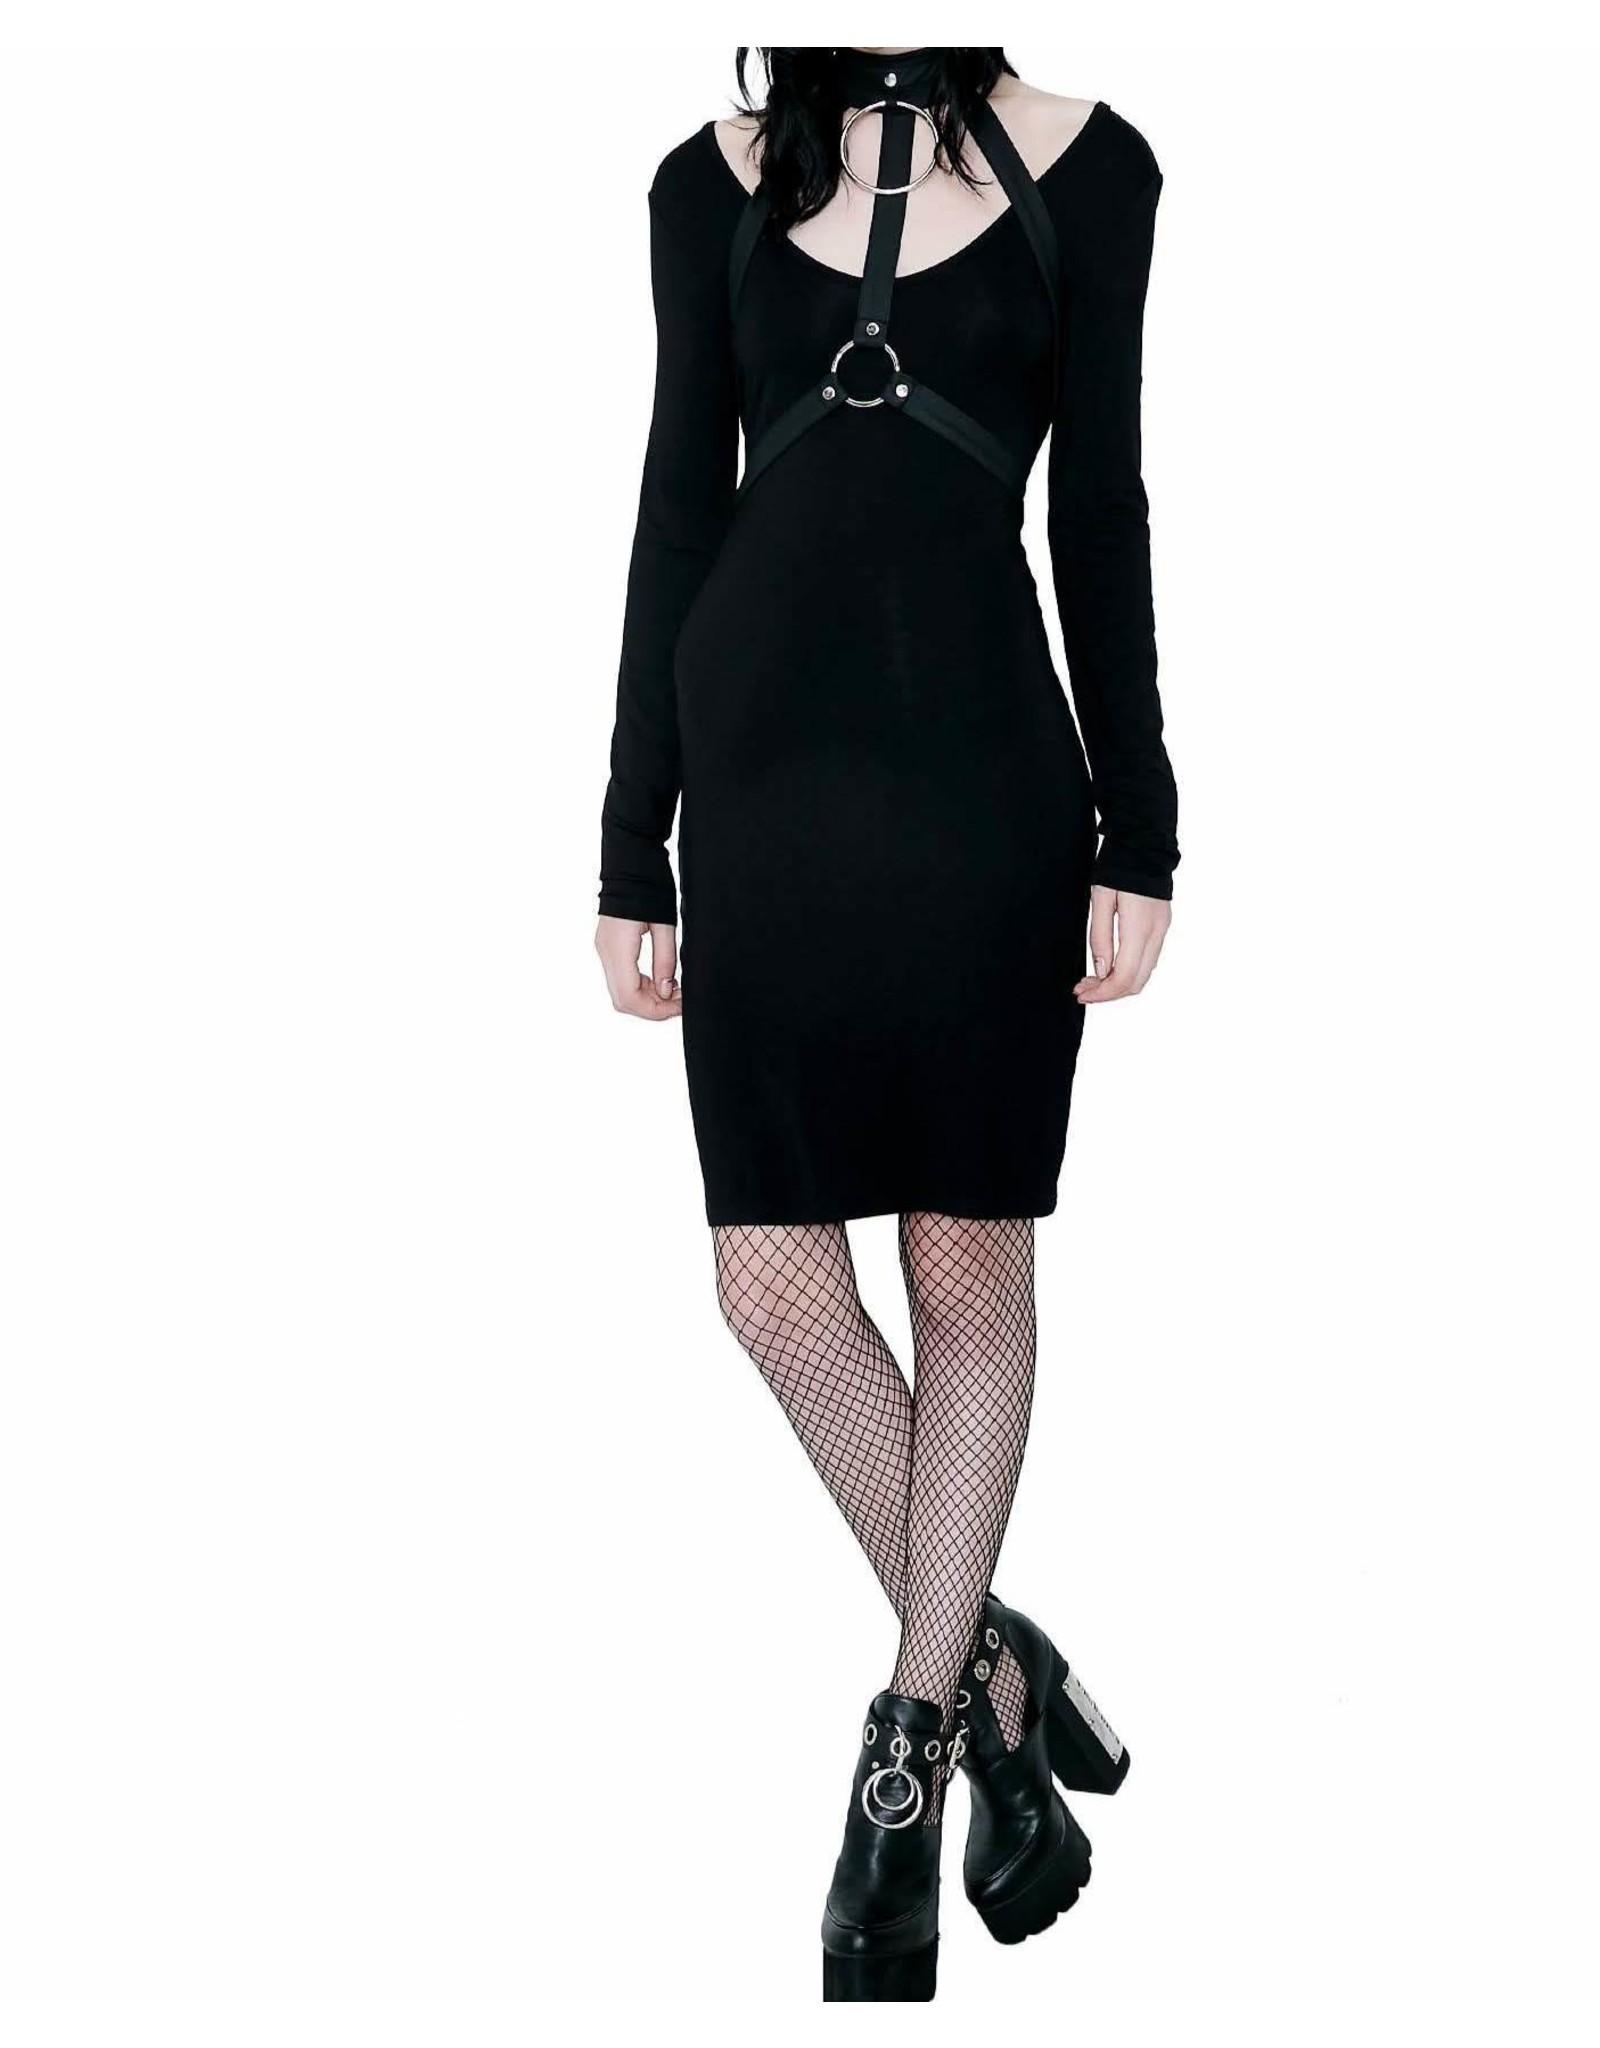 KILLSTAR - Jett Black She's Hot Dress